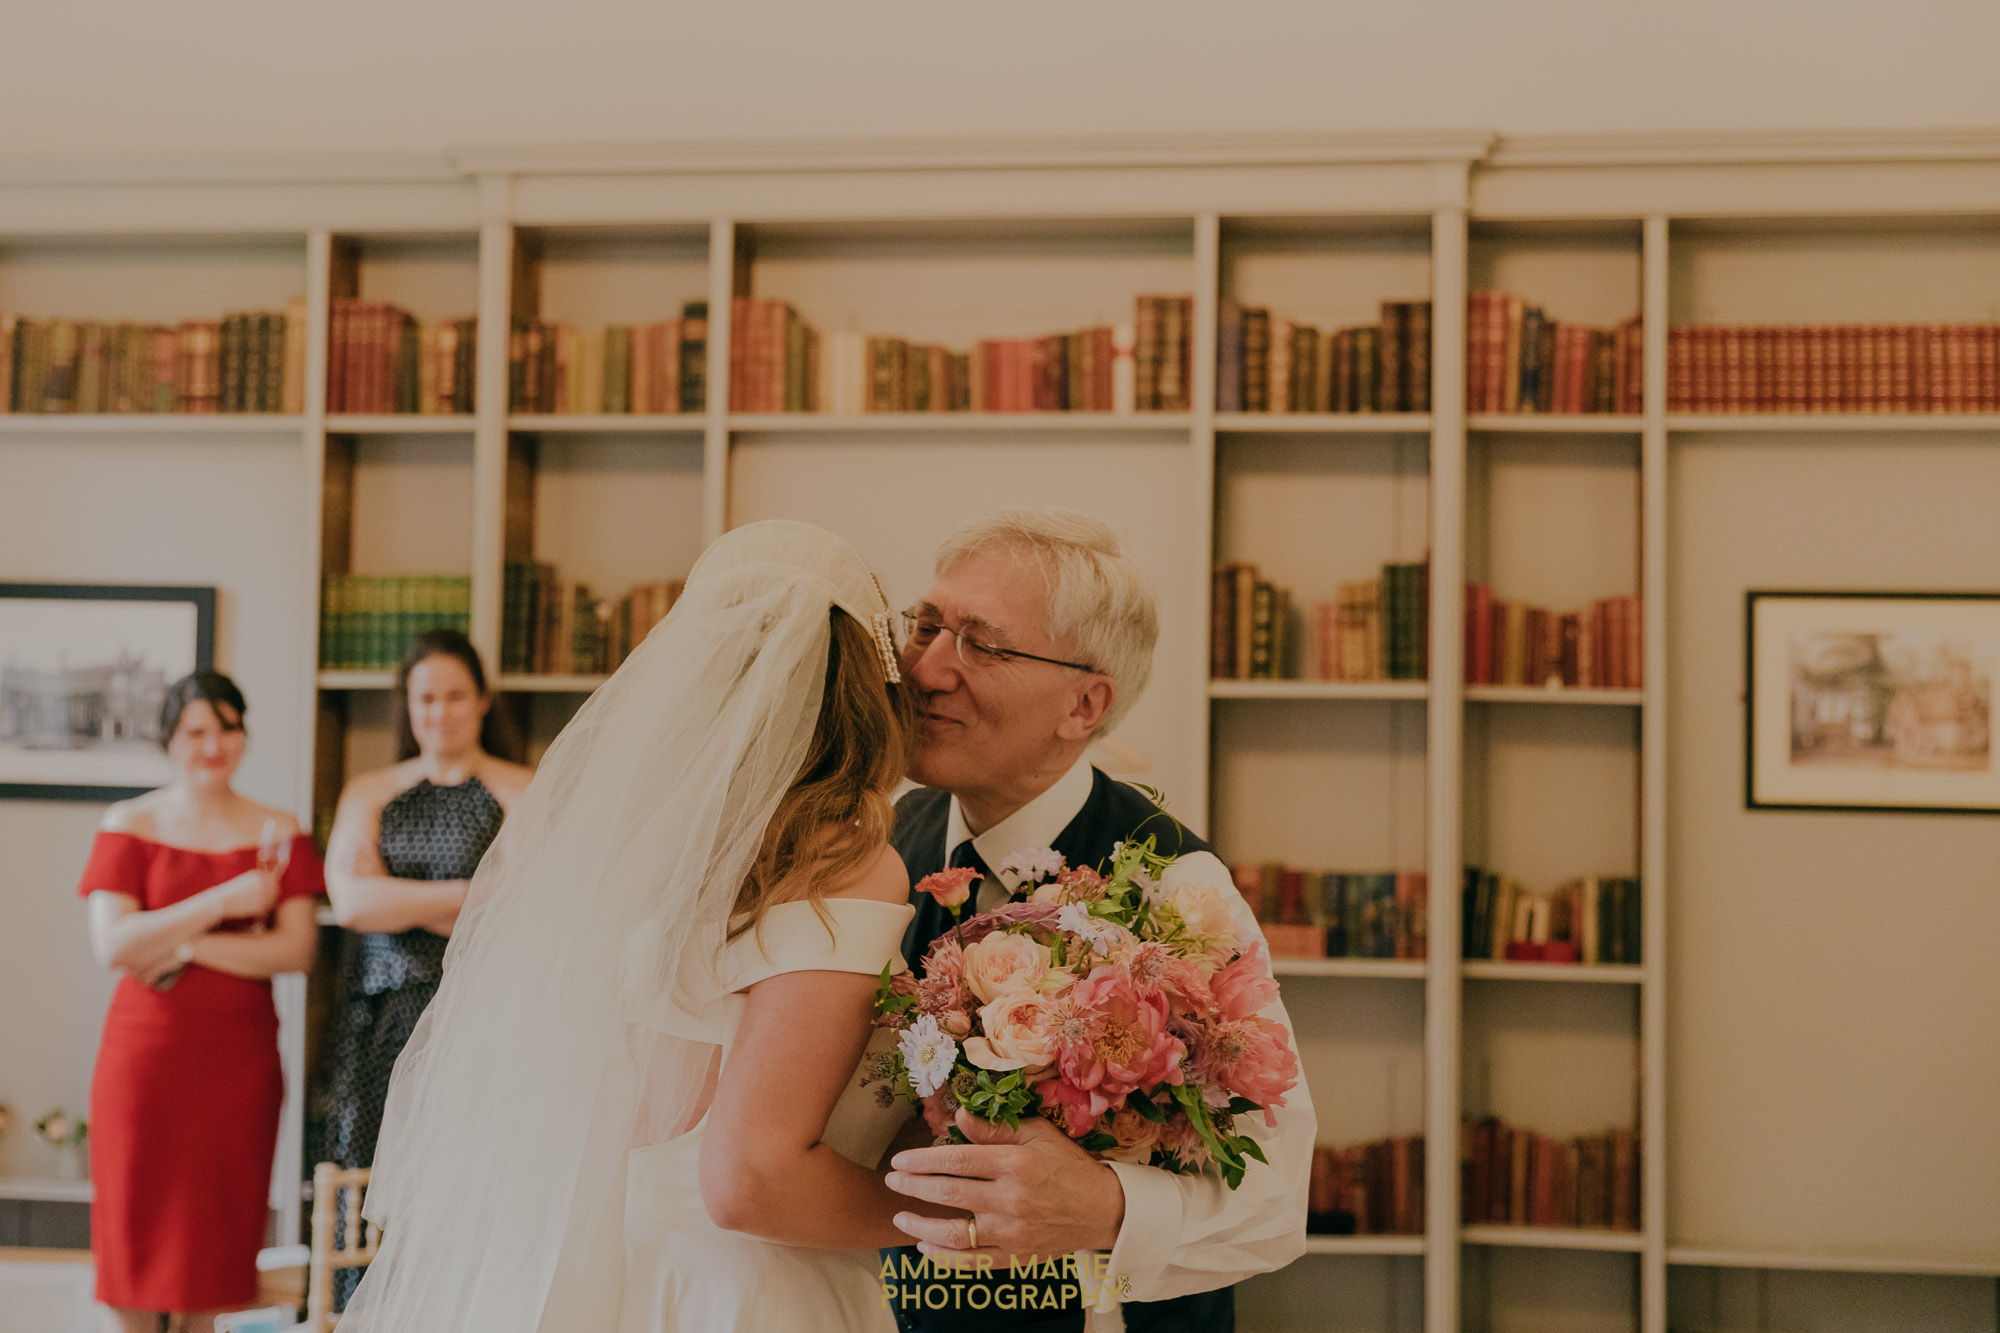 Dad kissing bride on cheek